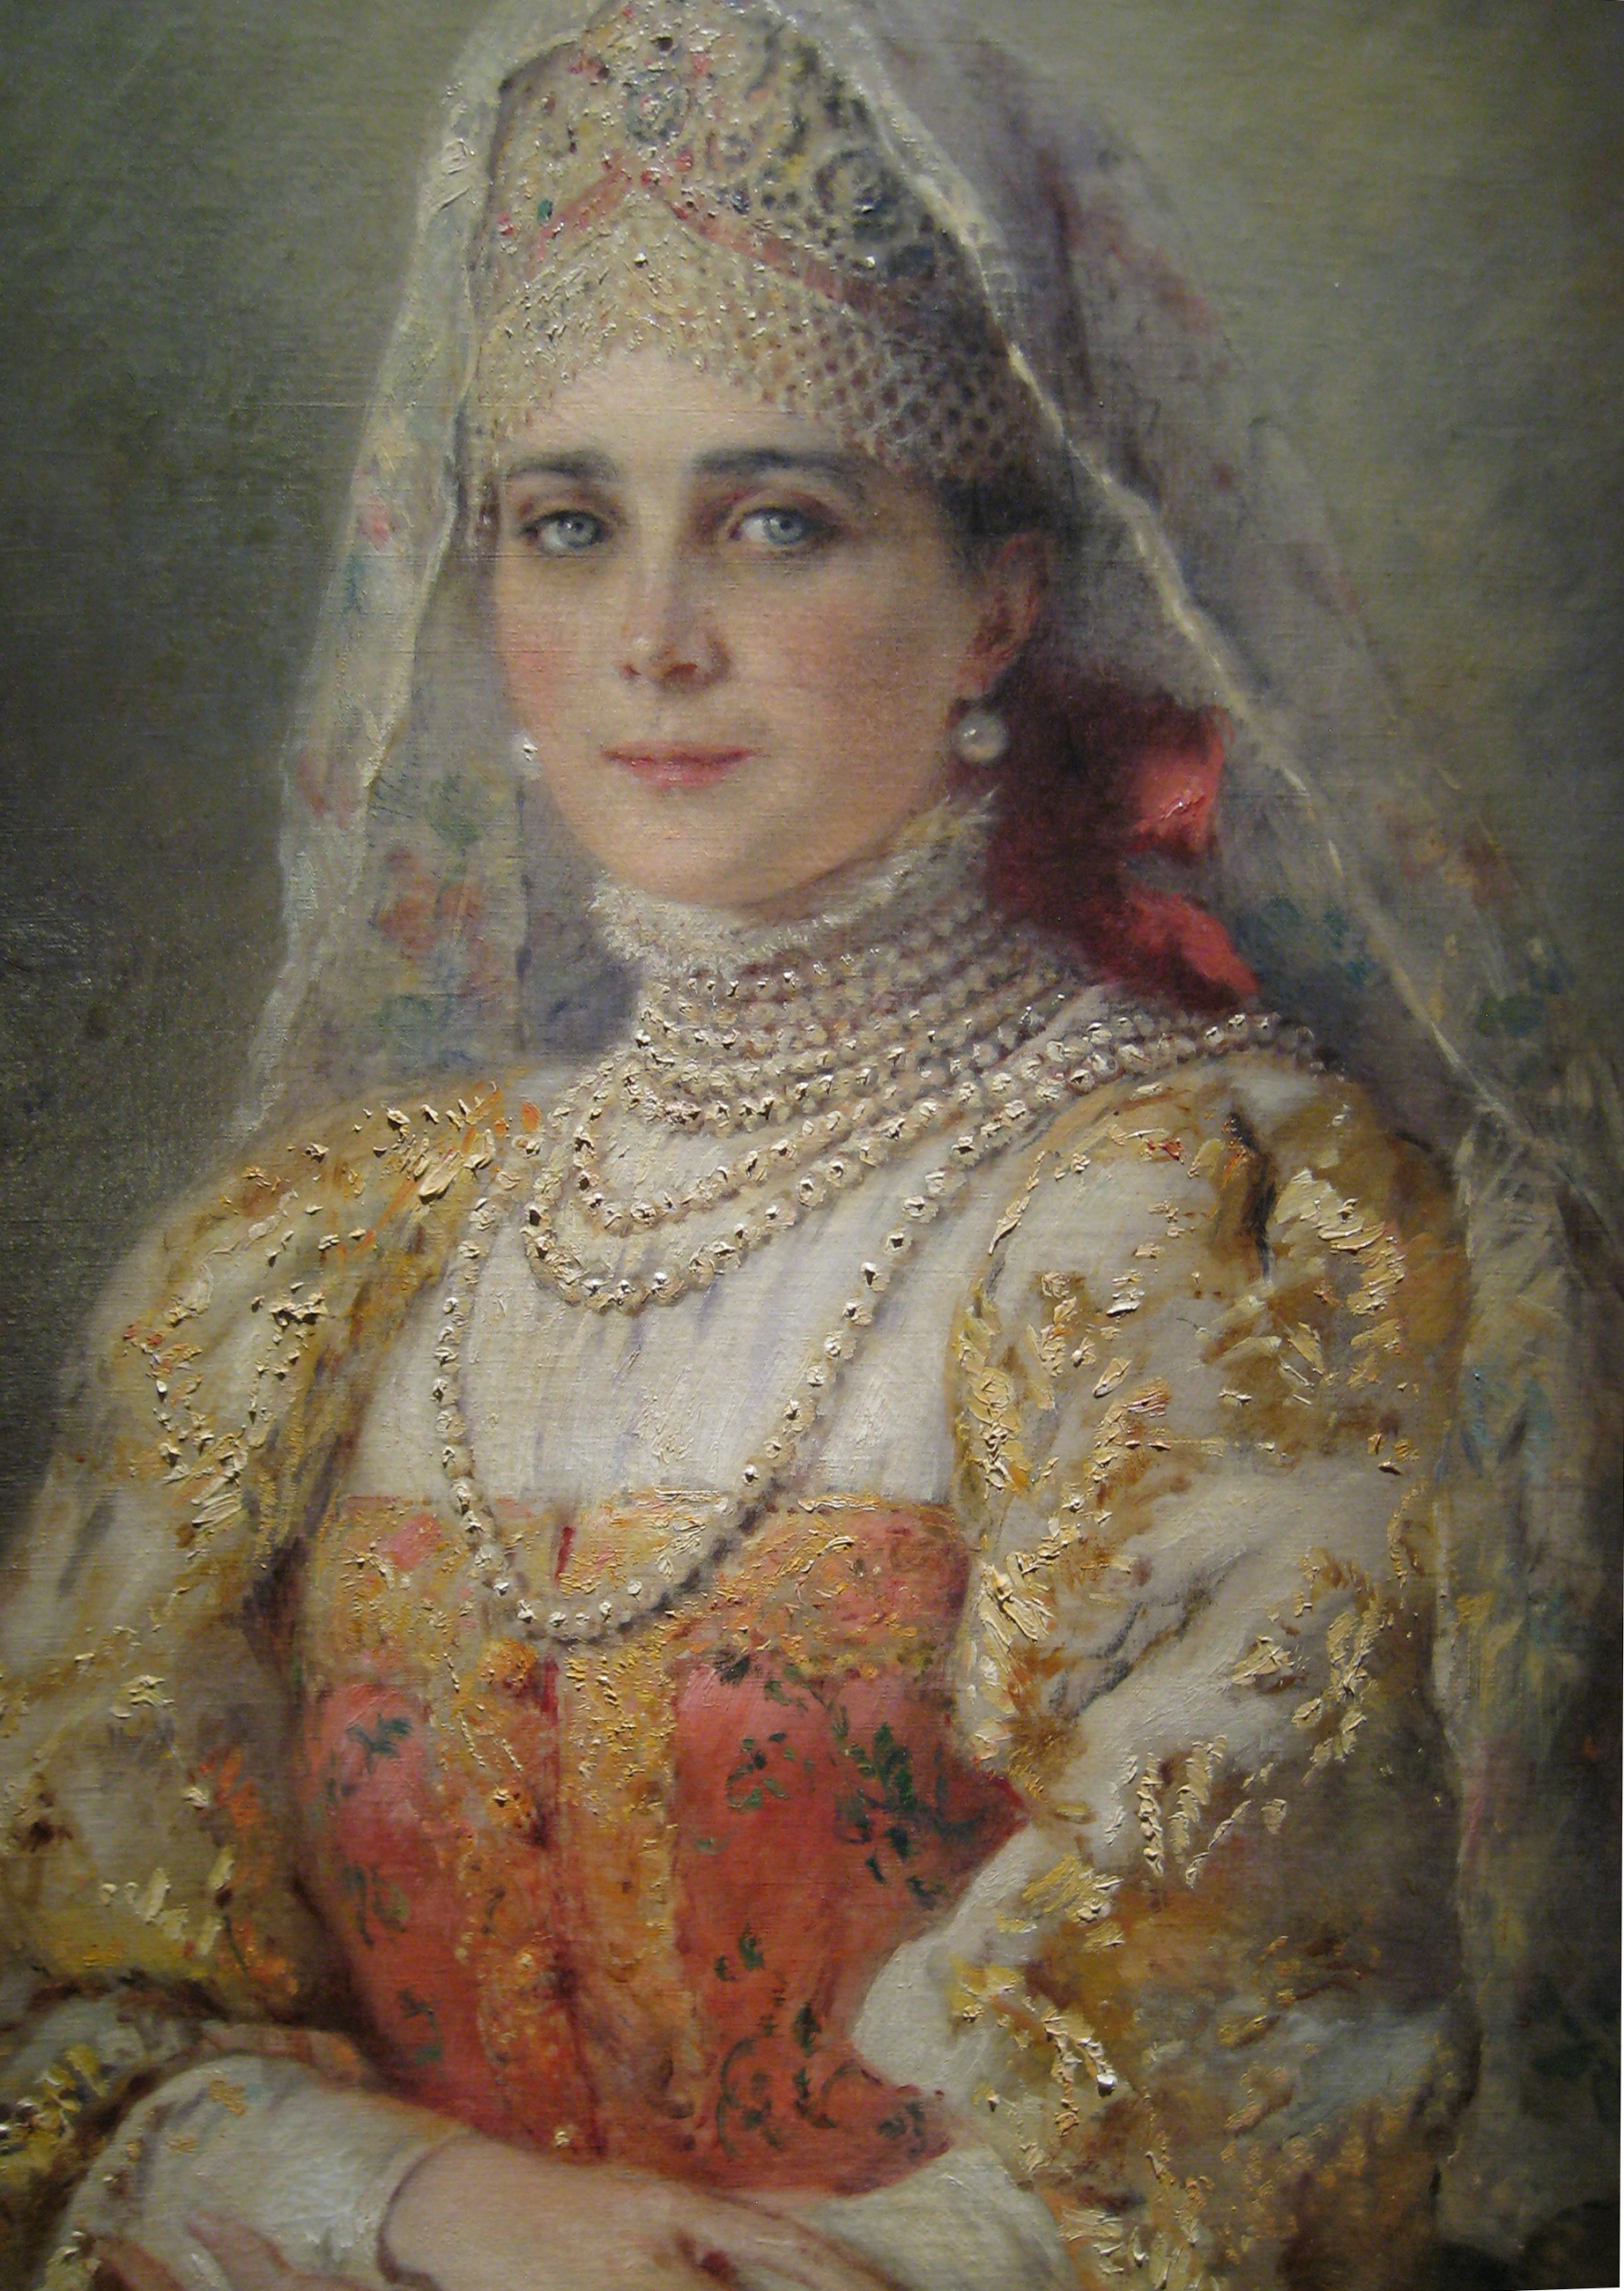 Файл:Zinaida Yusupova by Makovskiy - detail 01.jpg — Википедия